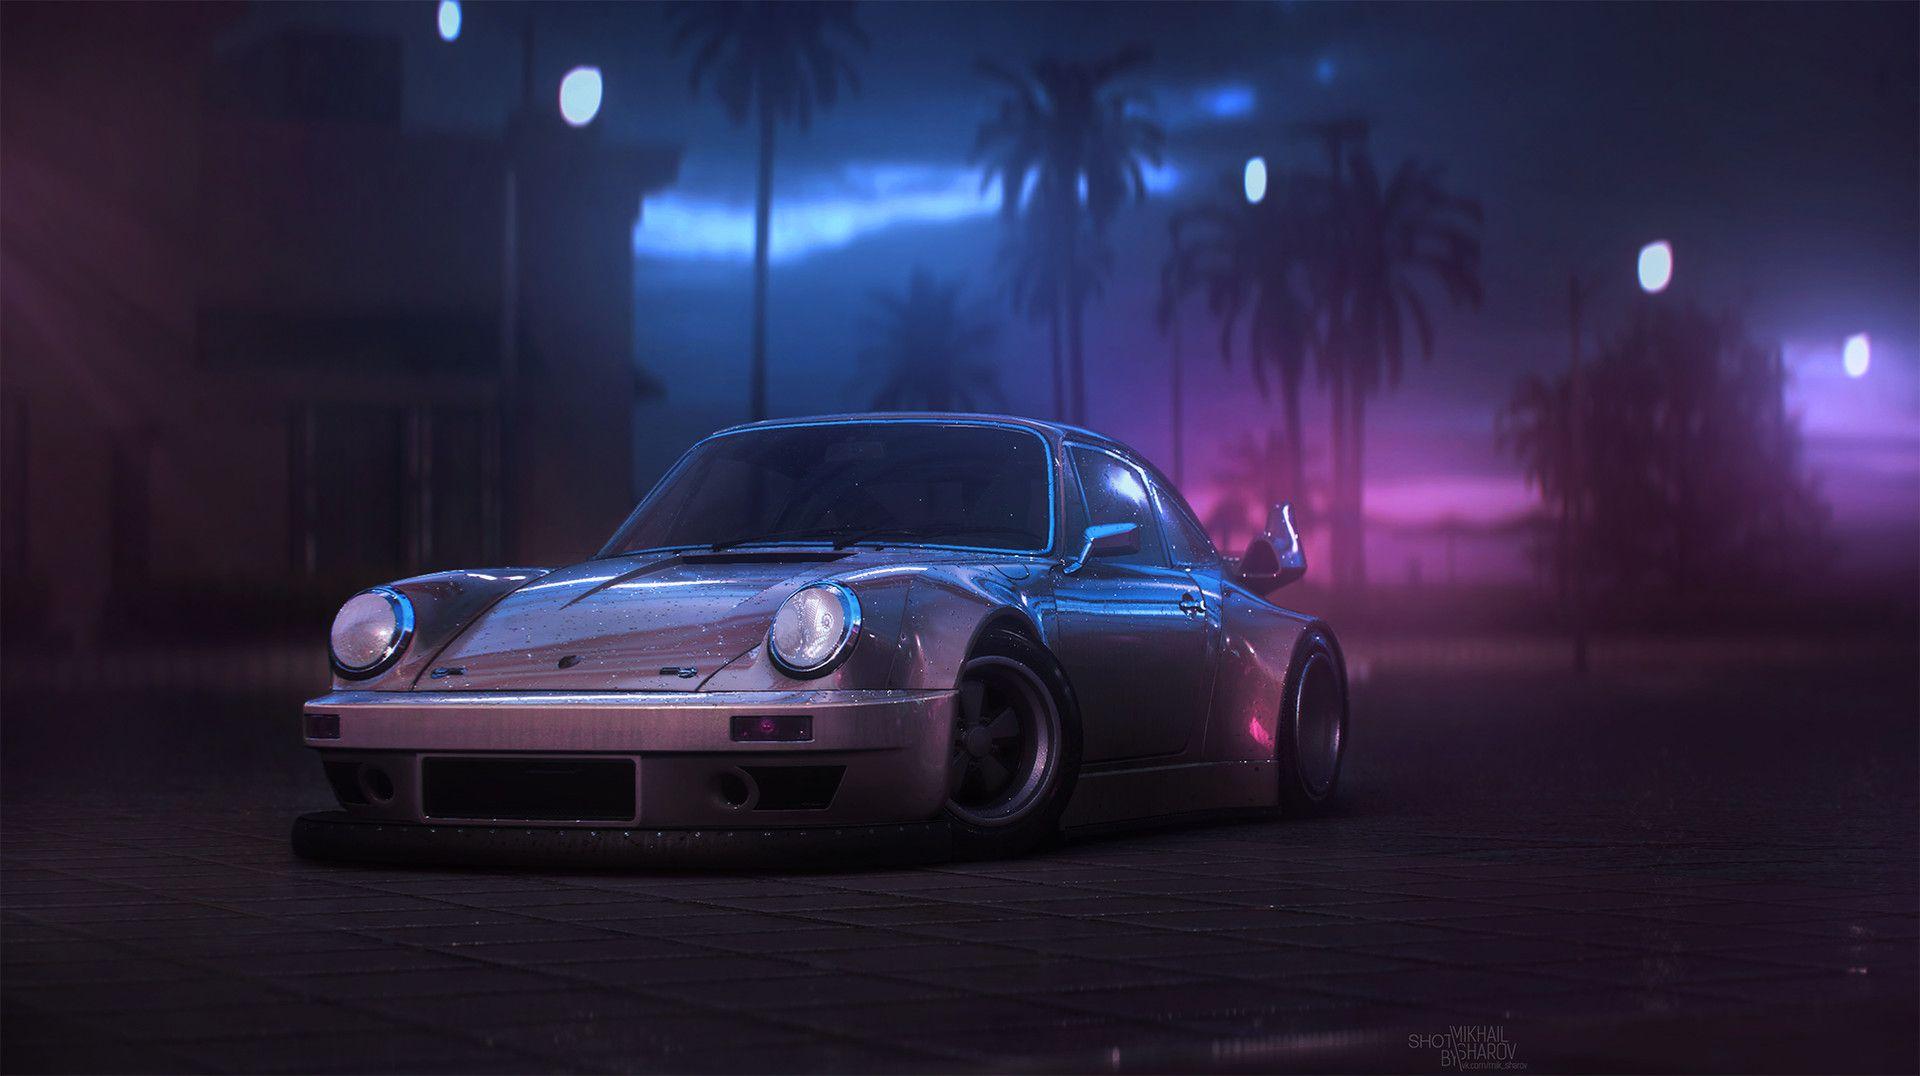 Http Bit Ly 1segzuo On Artstation Bymikhail Sharov Welcome To Miami Jdm Wallpaper Porsche 911 Car Wallpapers